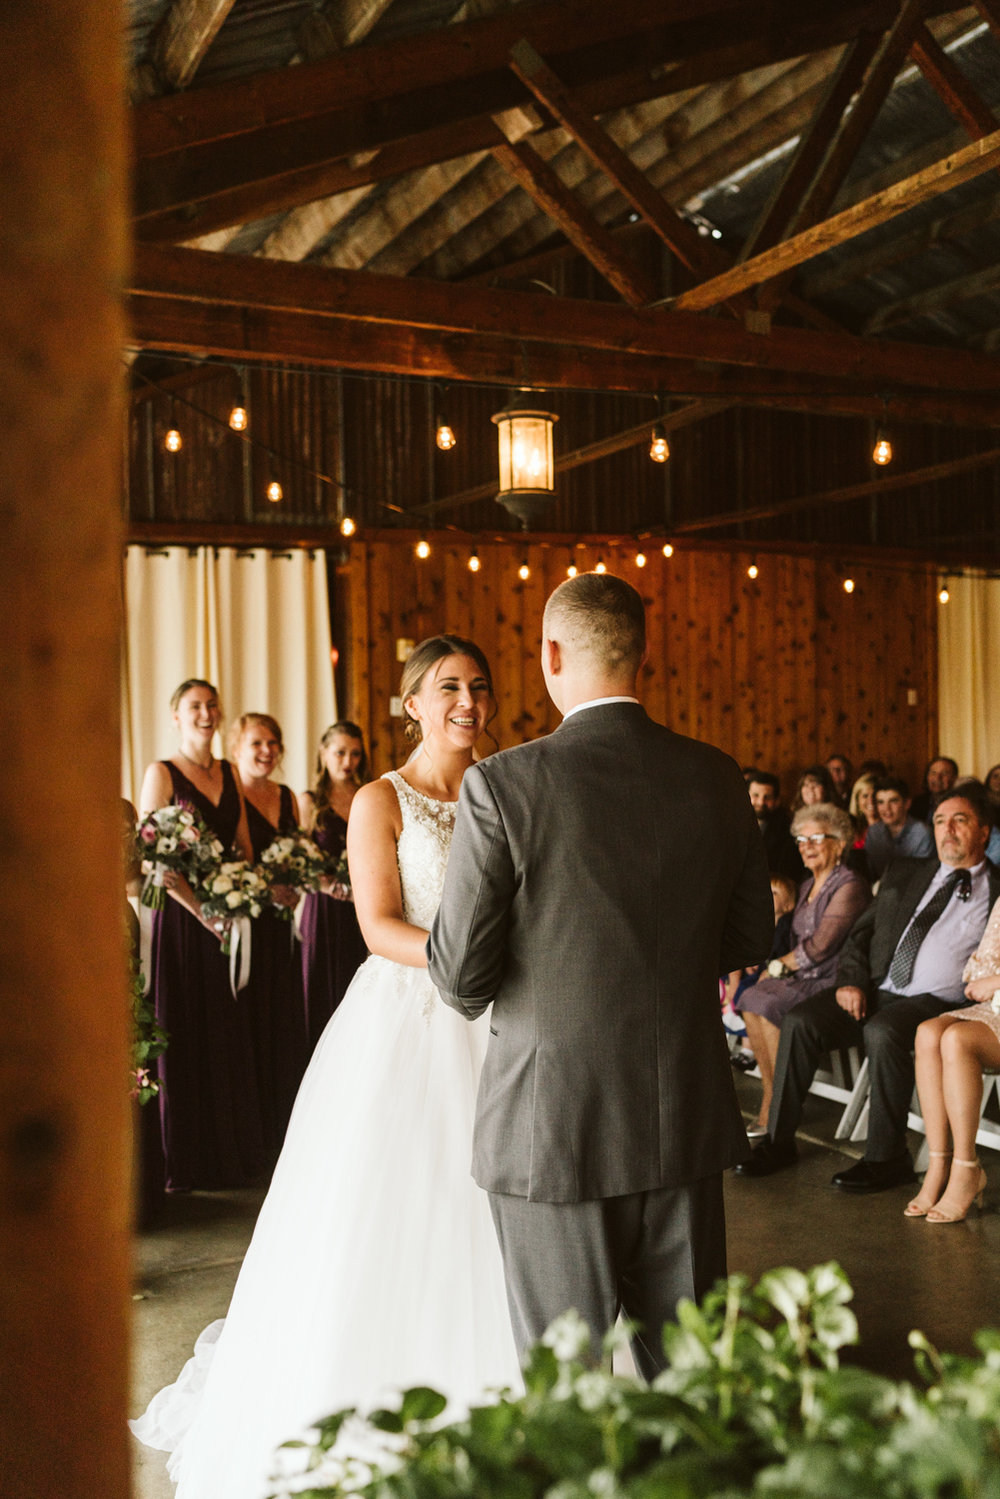 April Yentas Photography - jen and anthony wedding-51.jpg